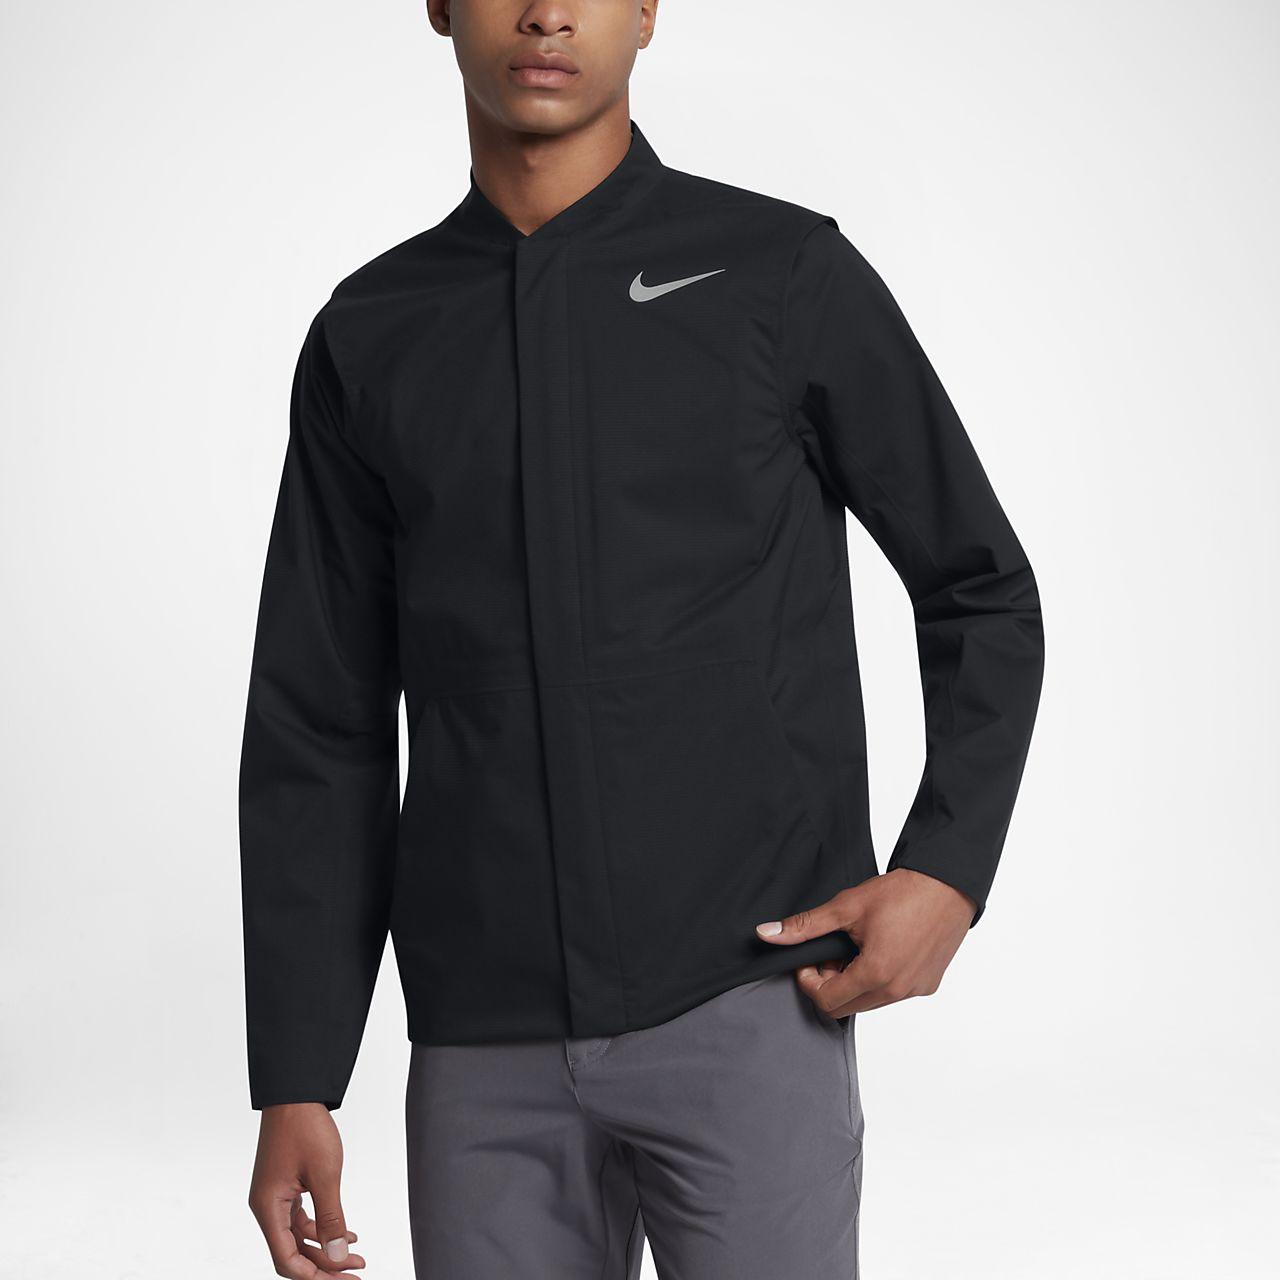 1ff4bbd72ec2 Nike HyperShield HyperAdapt Men s Golf Jacket. Nike.com